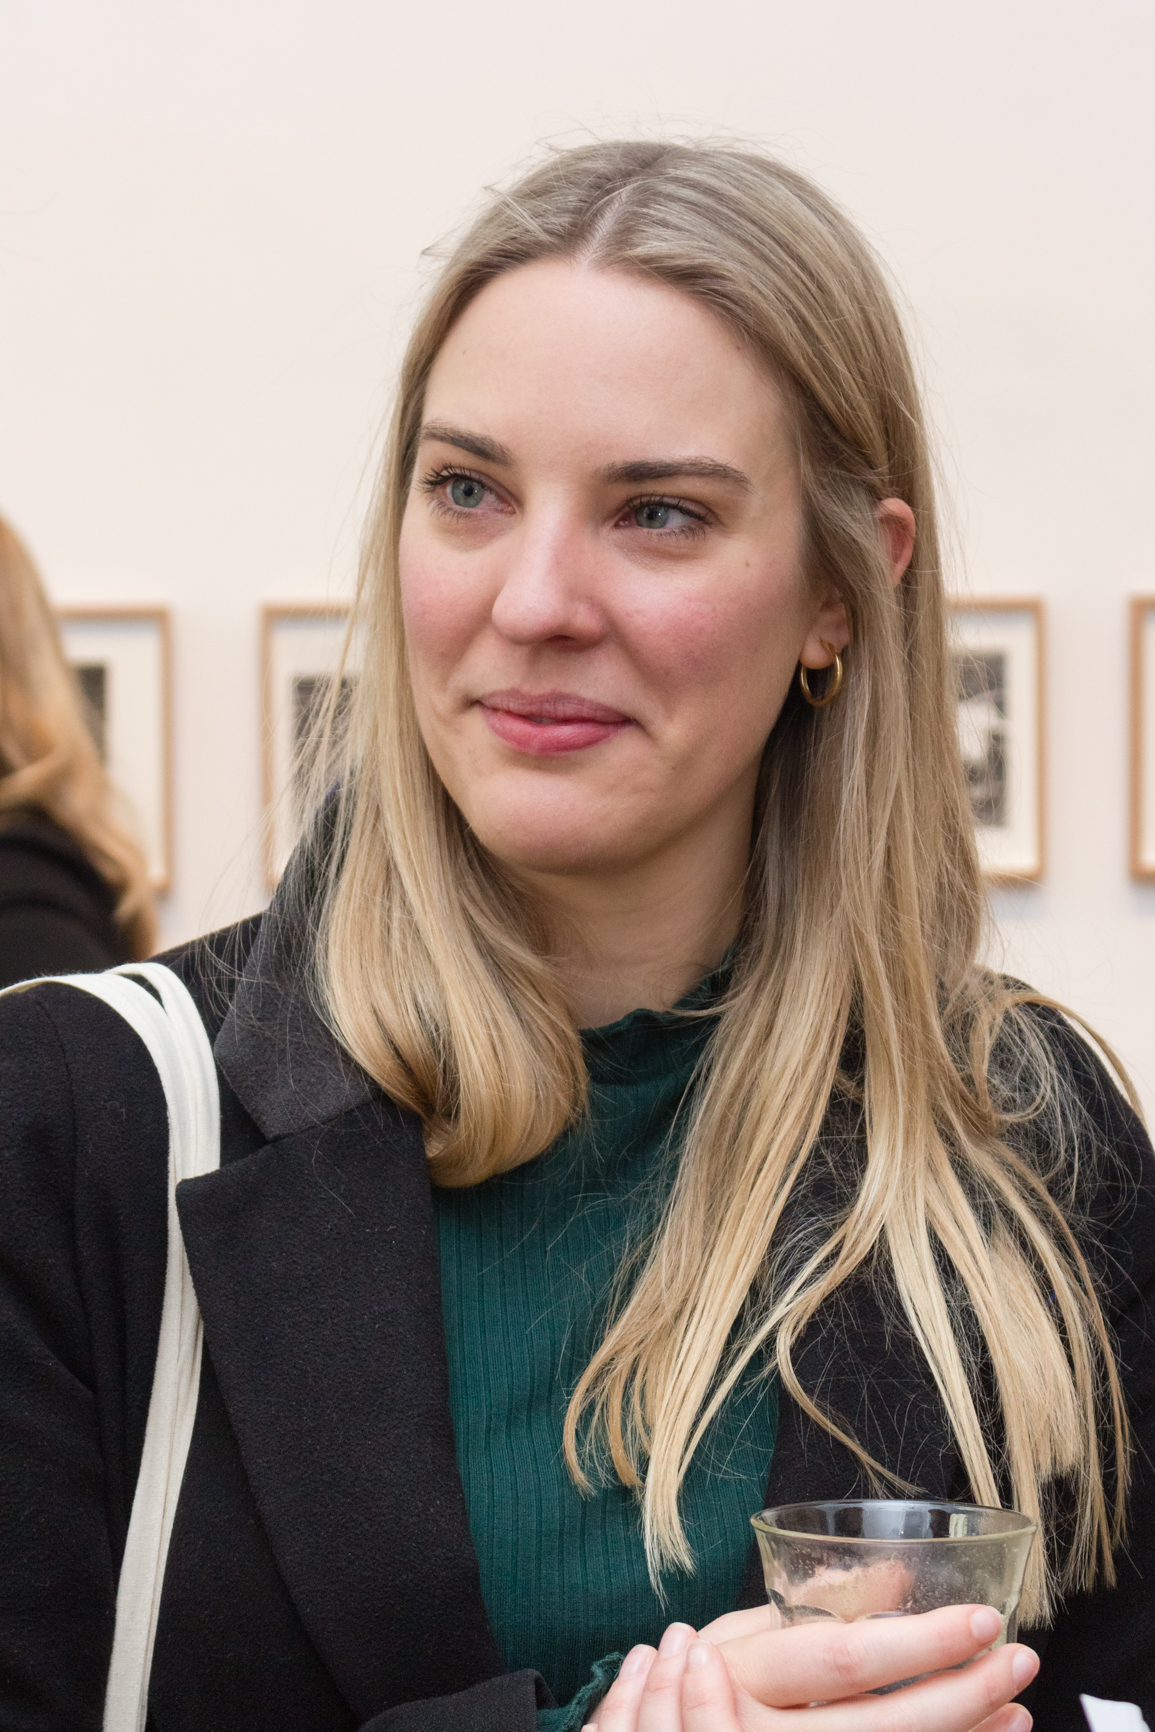 Rebecca Tooby-Desmond